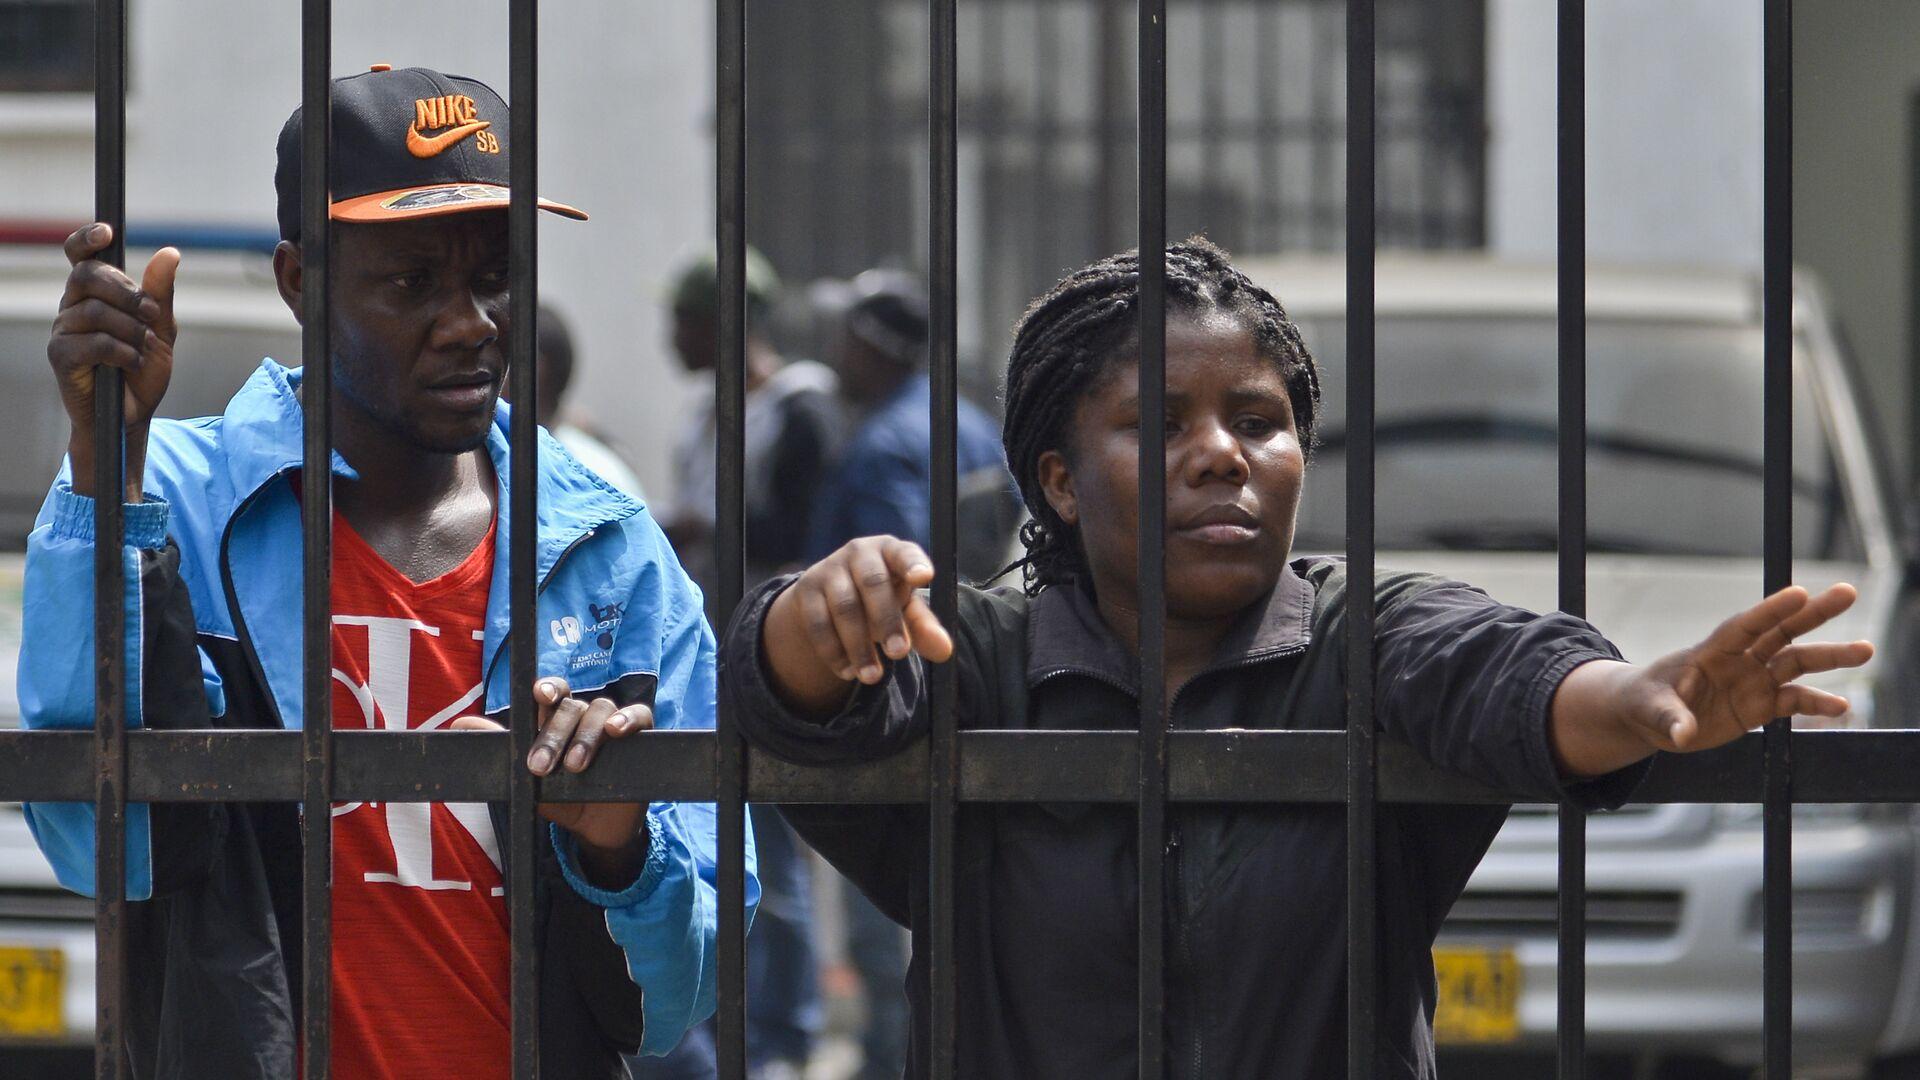 Migrantes haitianos - Sputnik Mundo, 1920, 20.09.2021